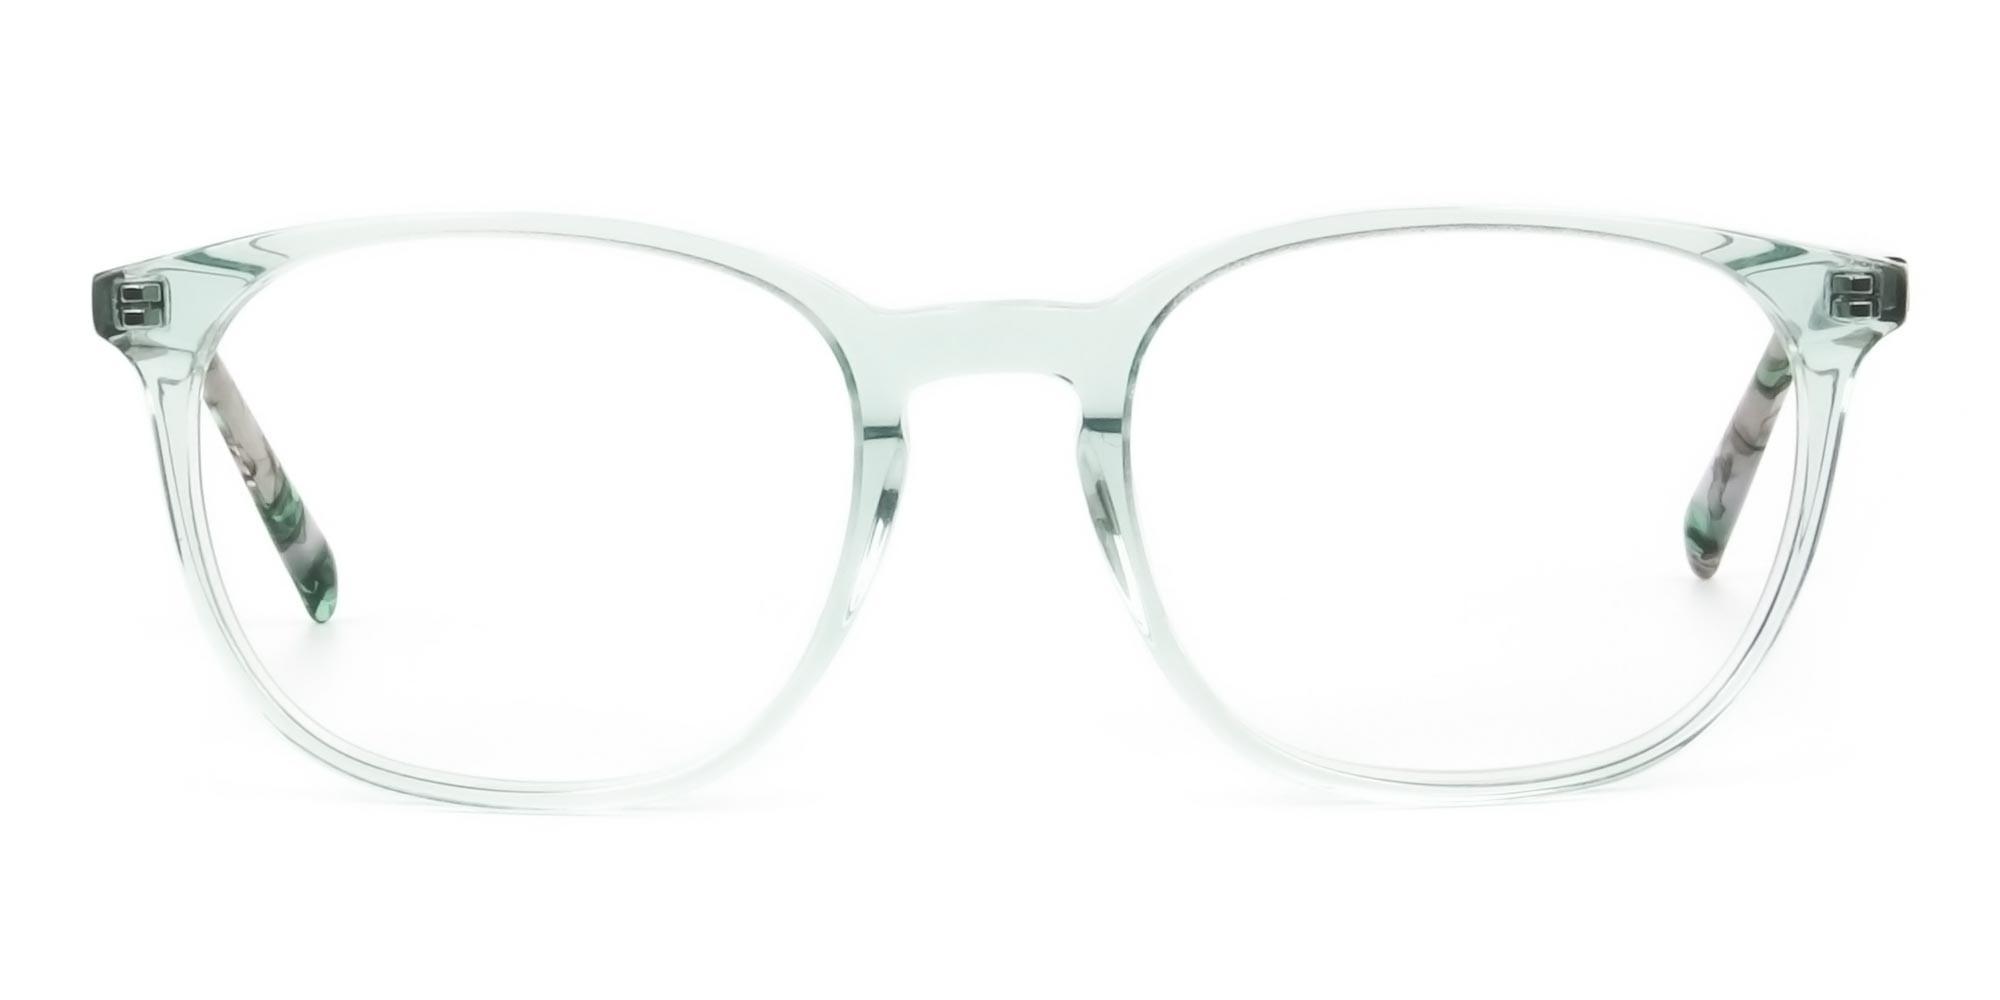 Teal Crysral Green Glasses in Wayfarer - 1